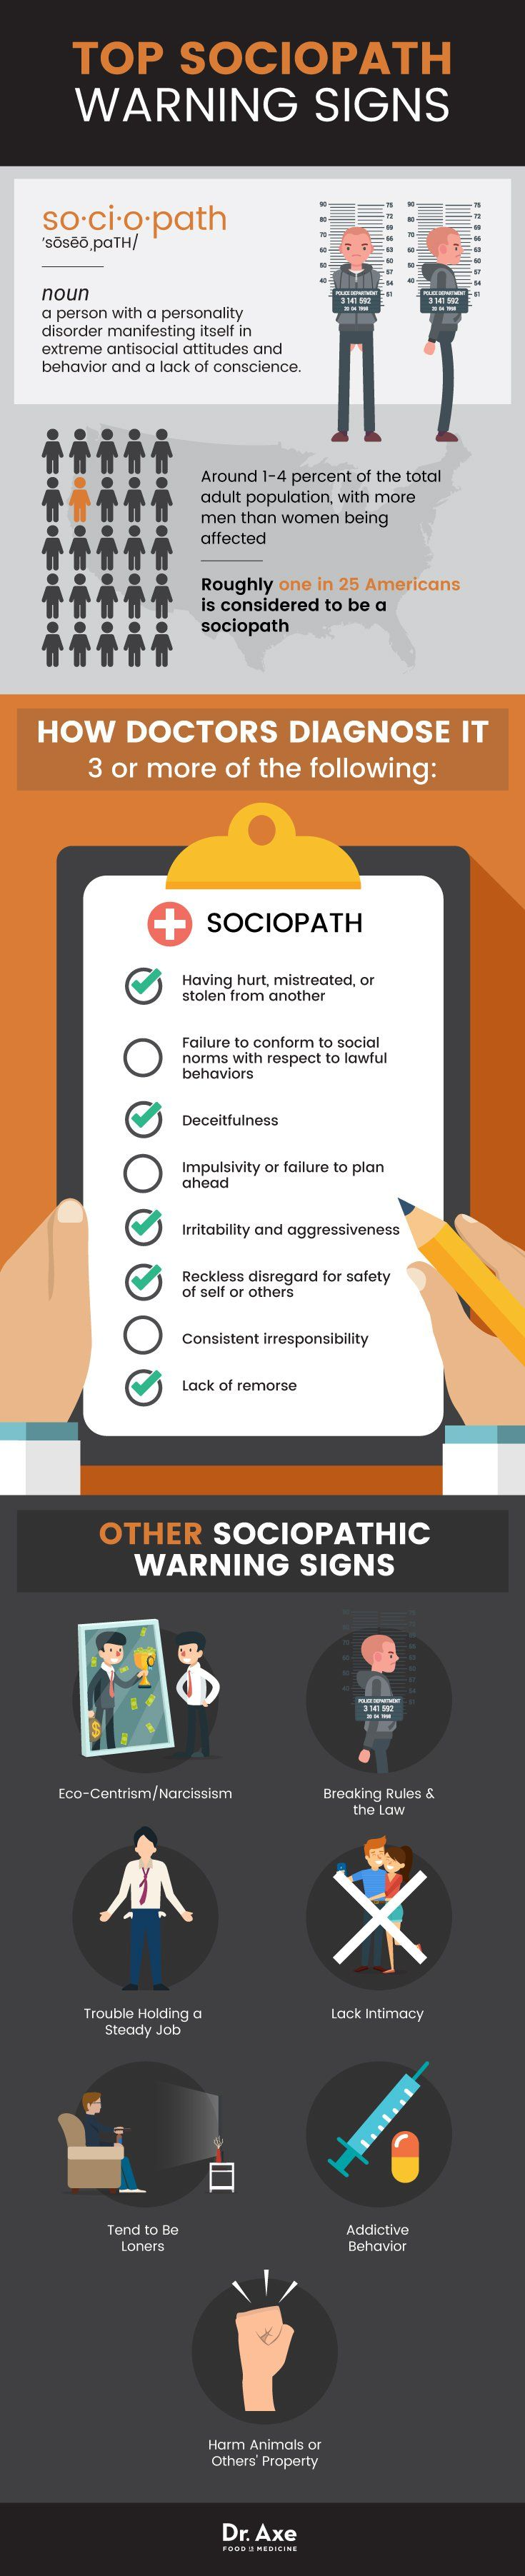 9 Questions that Help ID a Sociopath   Sociopathic ...